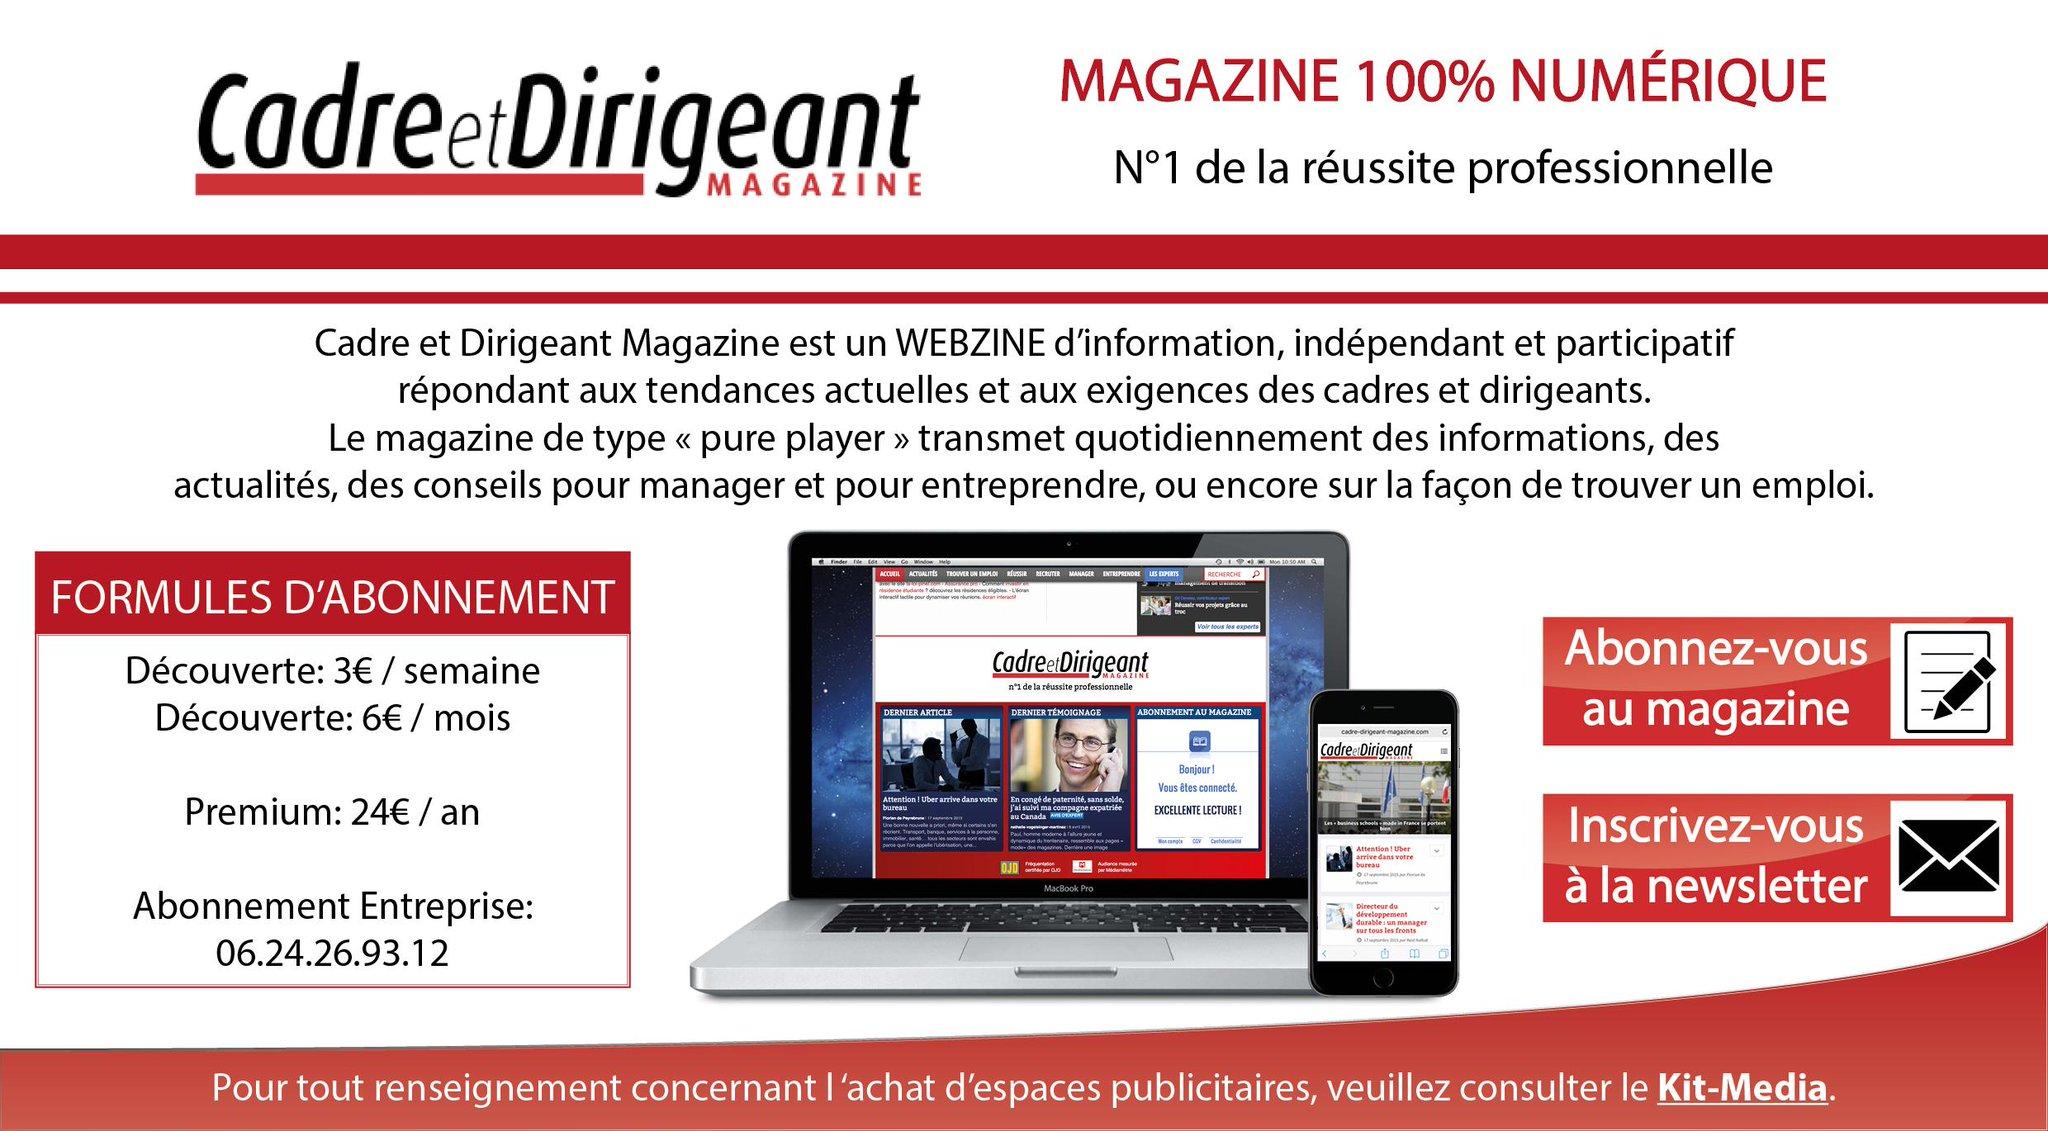 Lisez notre magazine 100% numérique .@CadresDirigeant #ECP15 #UEMEDEF15 #RunOrDyeFrance http://t.co/f8EttMdbw5